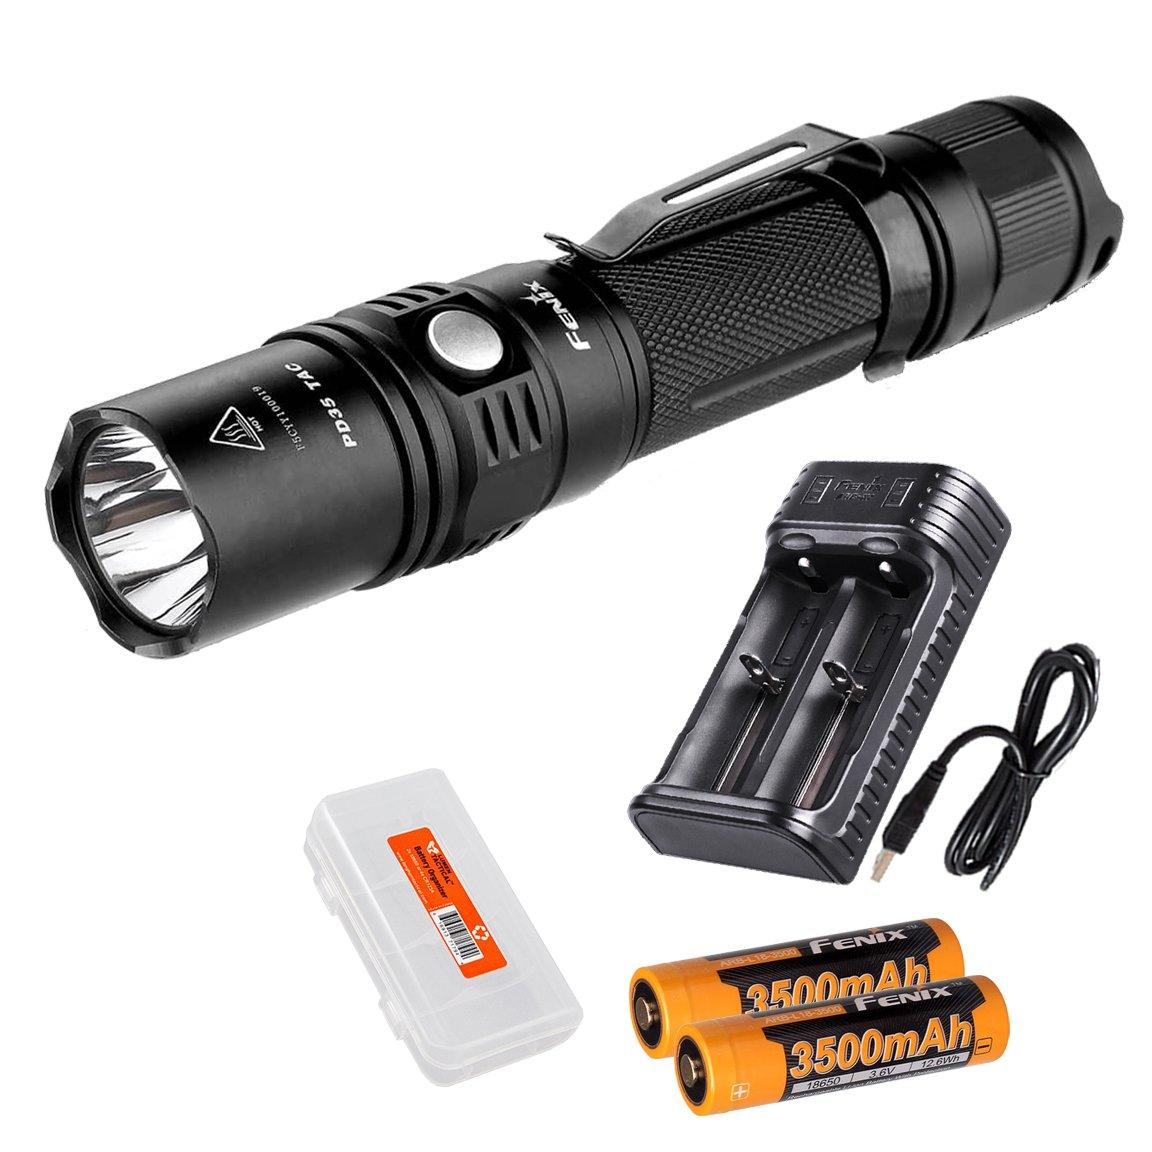 Ultimate Bundle: Fenix PD35TAC (PD35 Tactical) 1000 Lumens Cree XP-L Flashlight, 2x Fenix 3500mAh 18650 Batteries, Smart Charger, LumenTac Battery Organizer